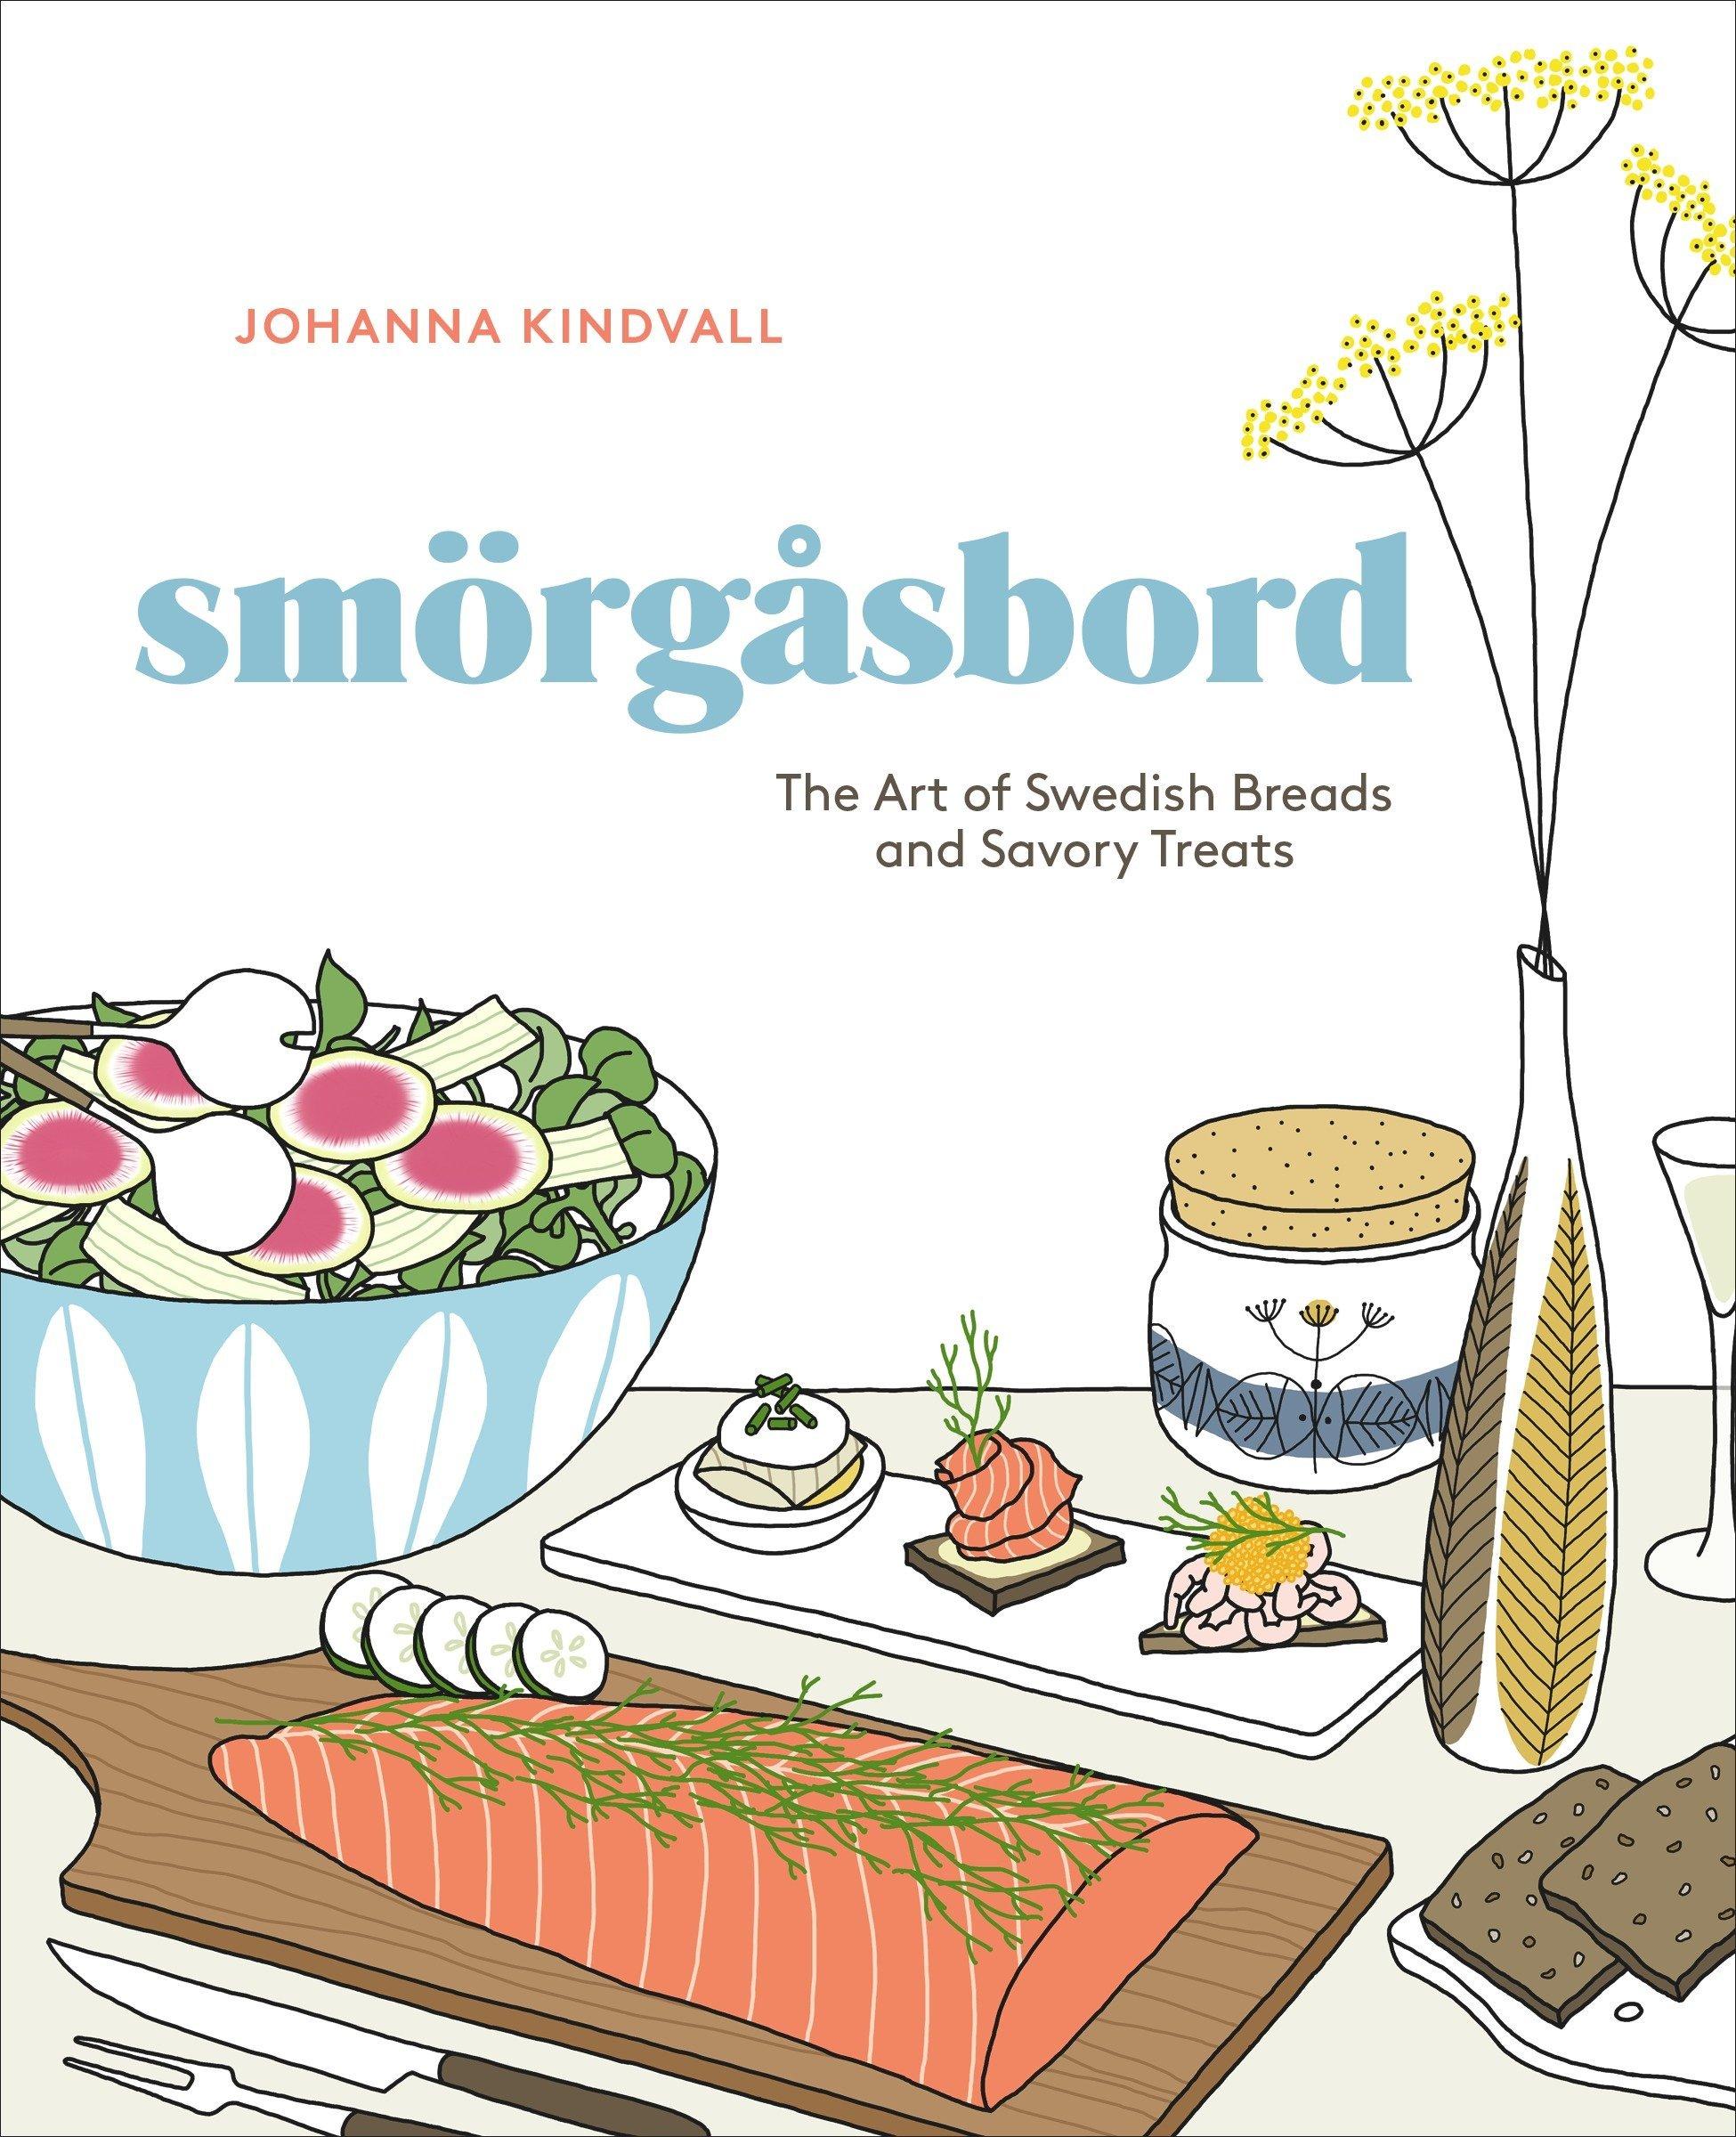 Smorgasbord - Swedish Breads & Savory Treats Cookbook $12